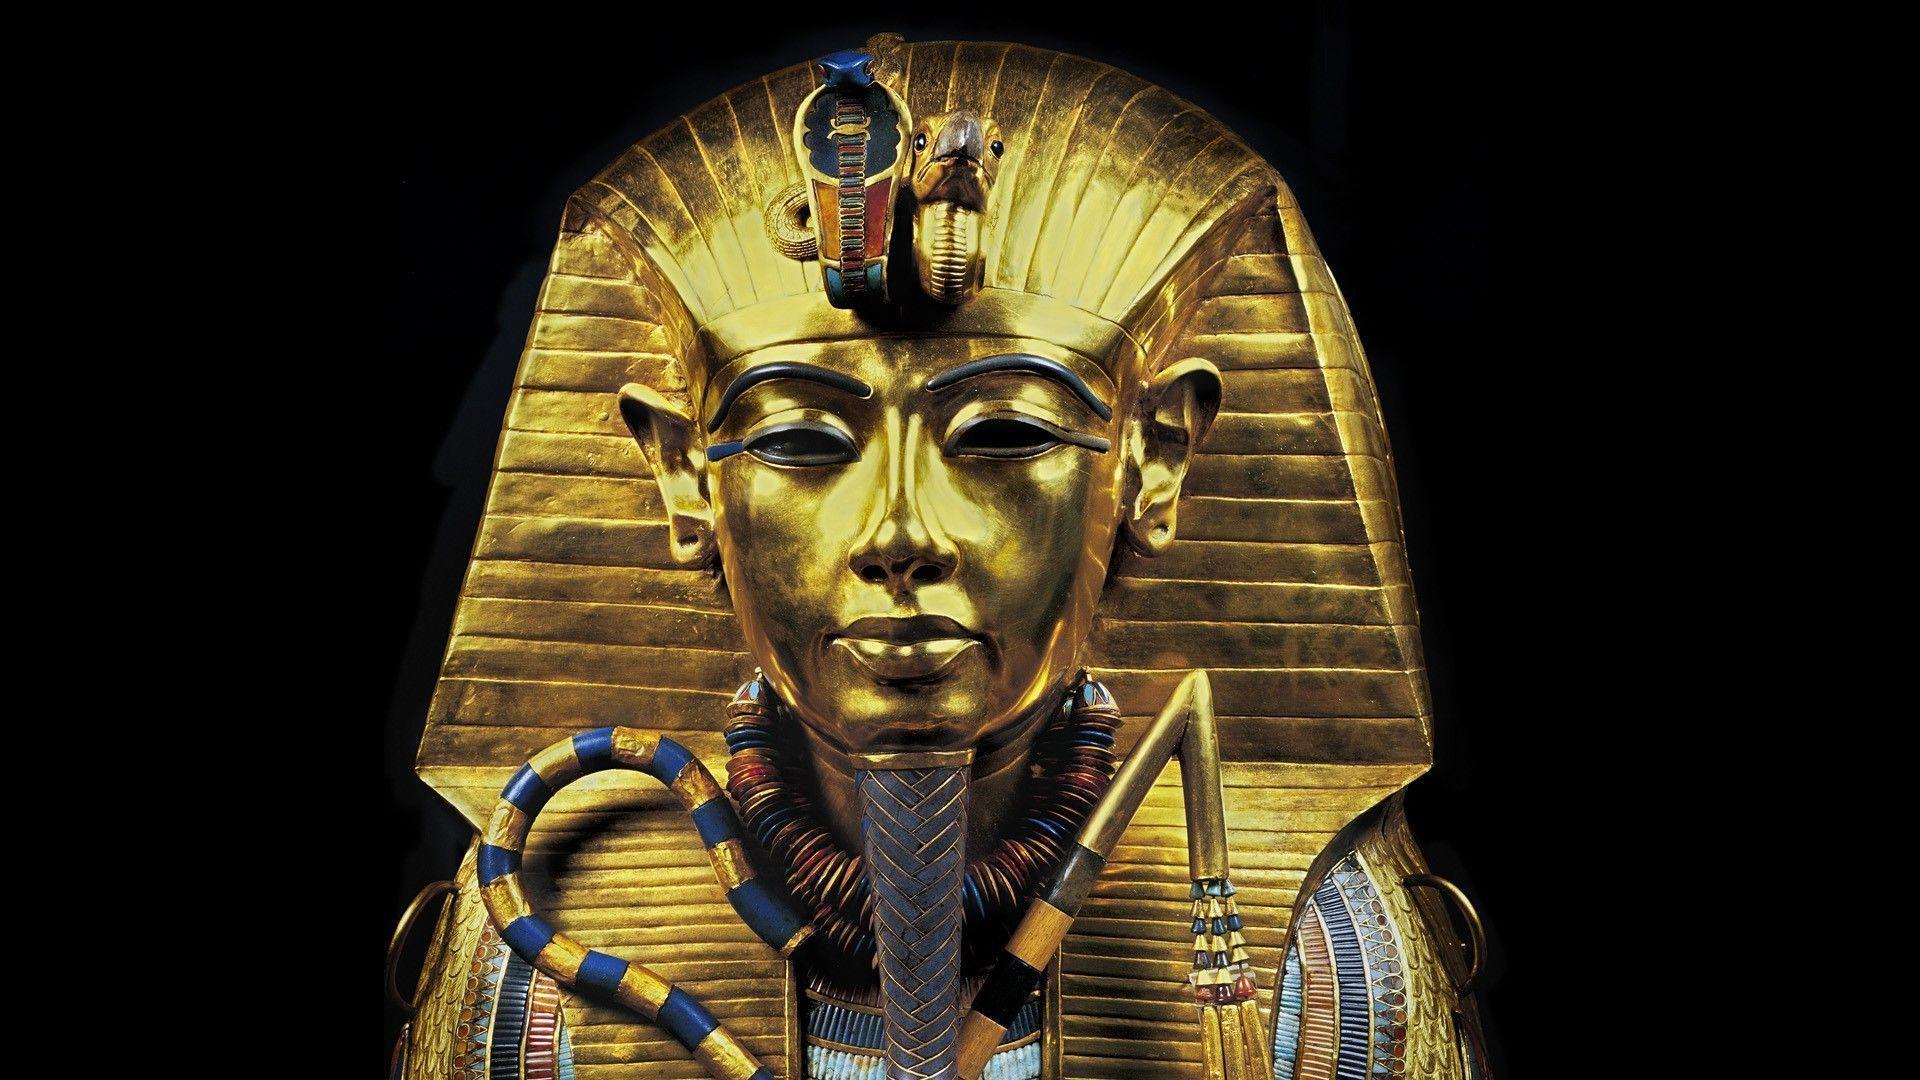 Golden Pharaoh Statue Wallpaper